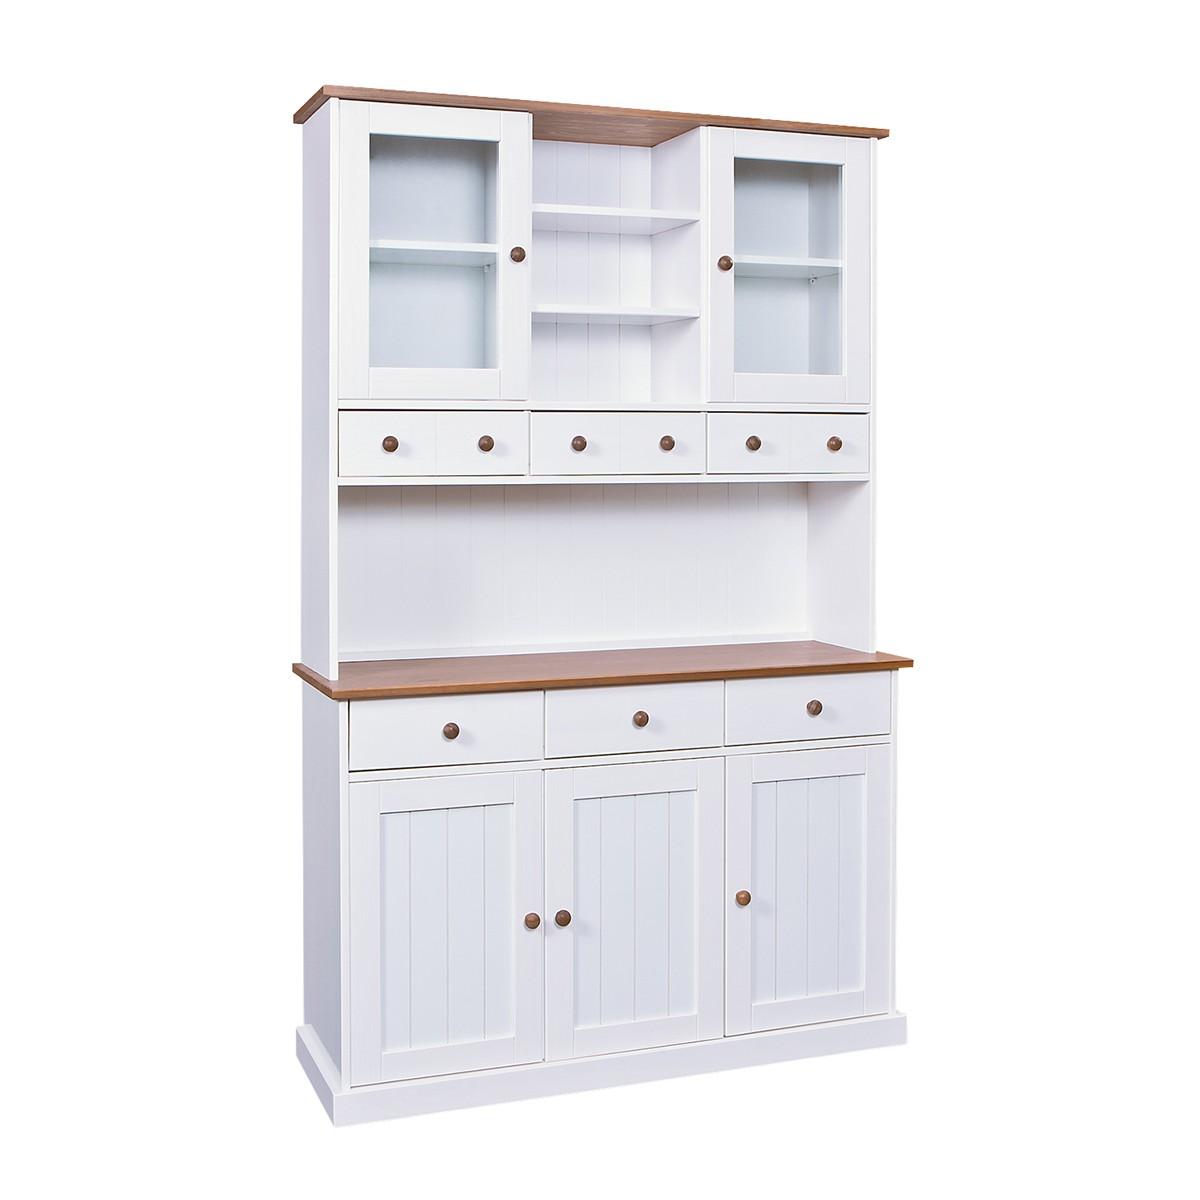 SOCOA - Vaisselier 5 portes 6 tiroirs en pin massif blanc